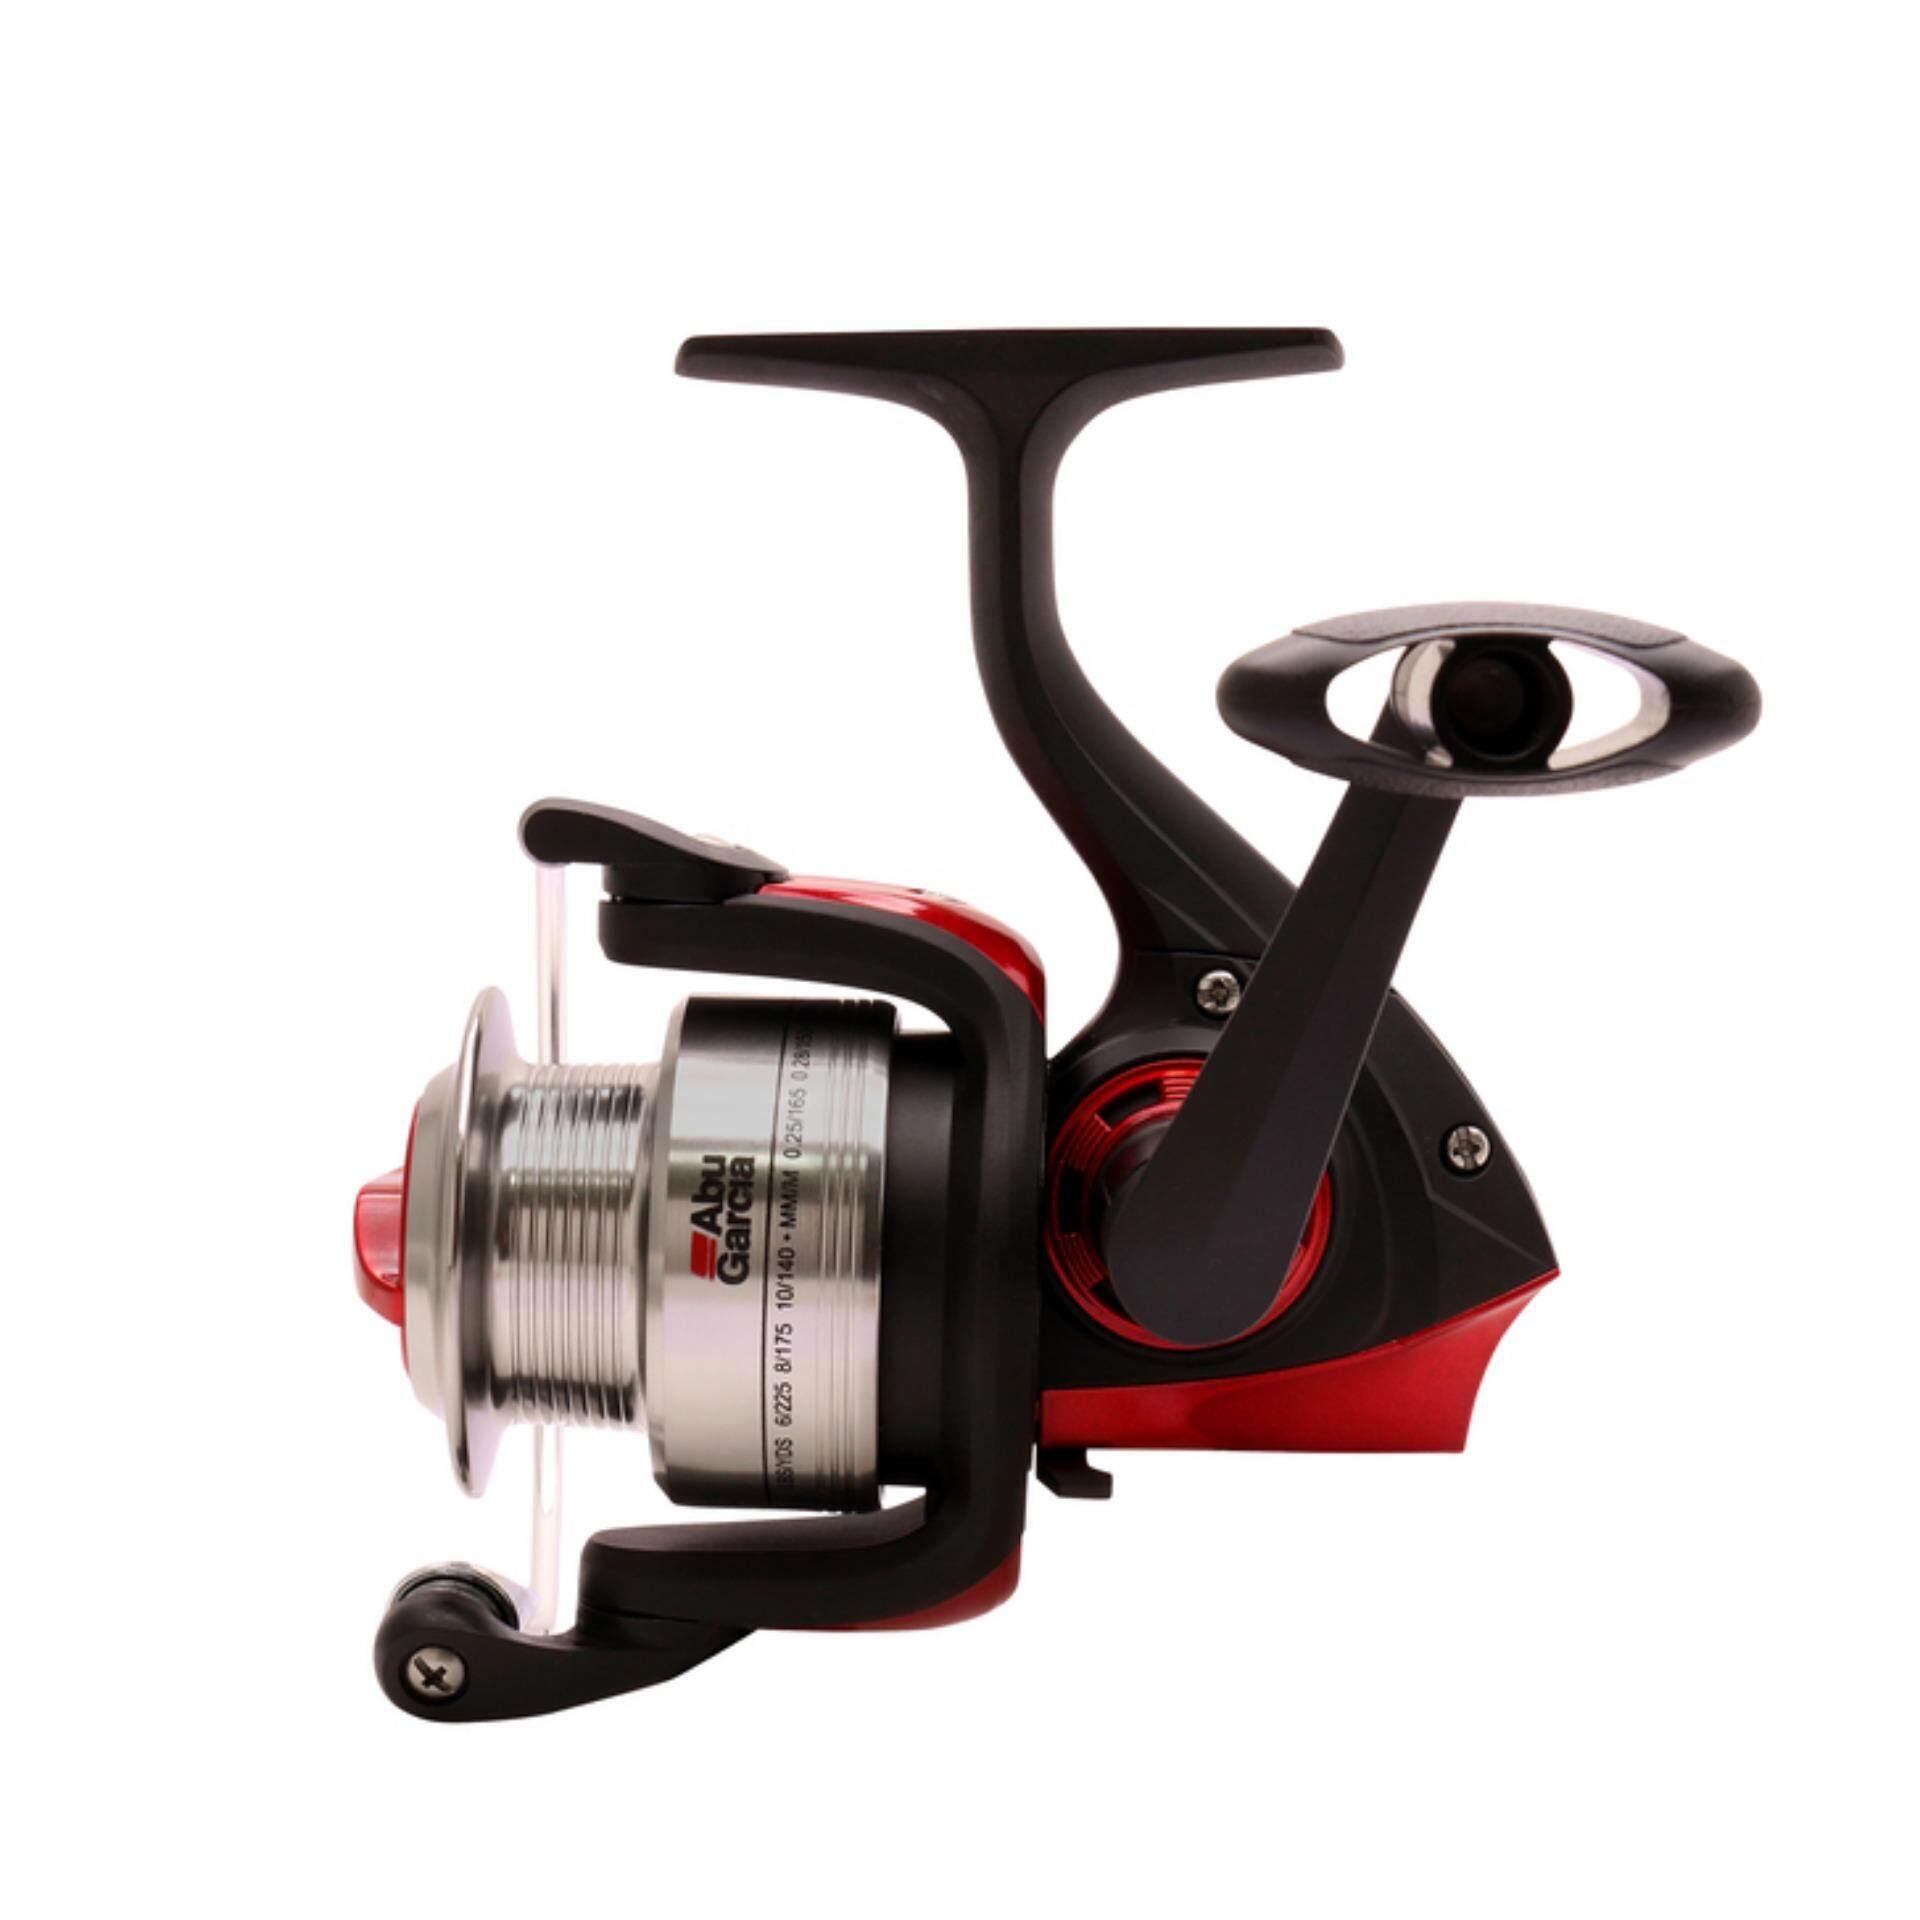 Abu Cardinal 53Fd Spin Reel (Black) - intl